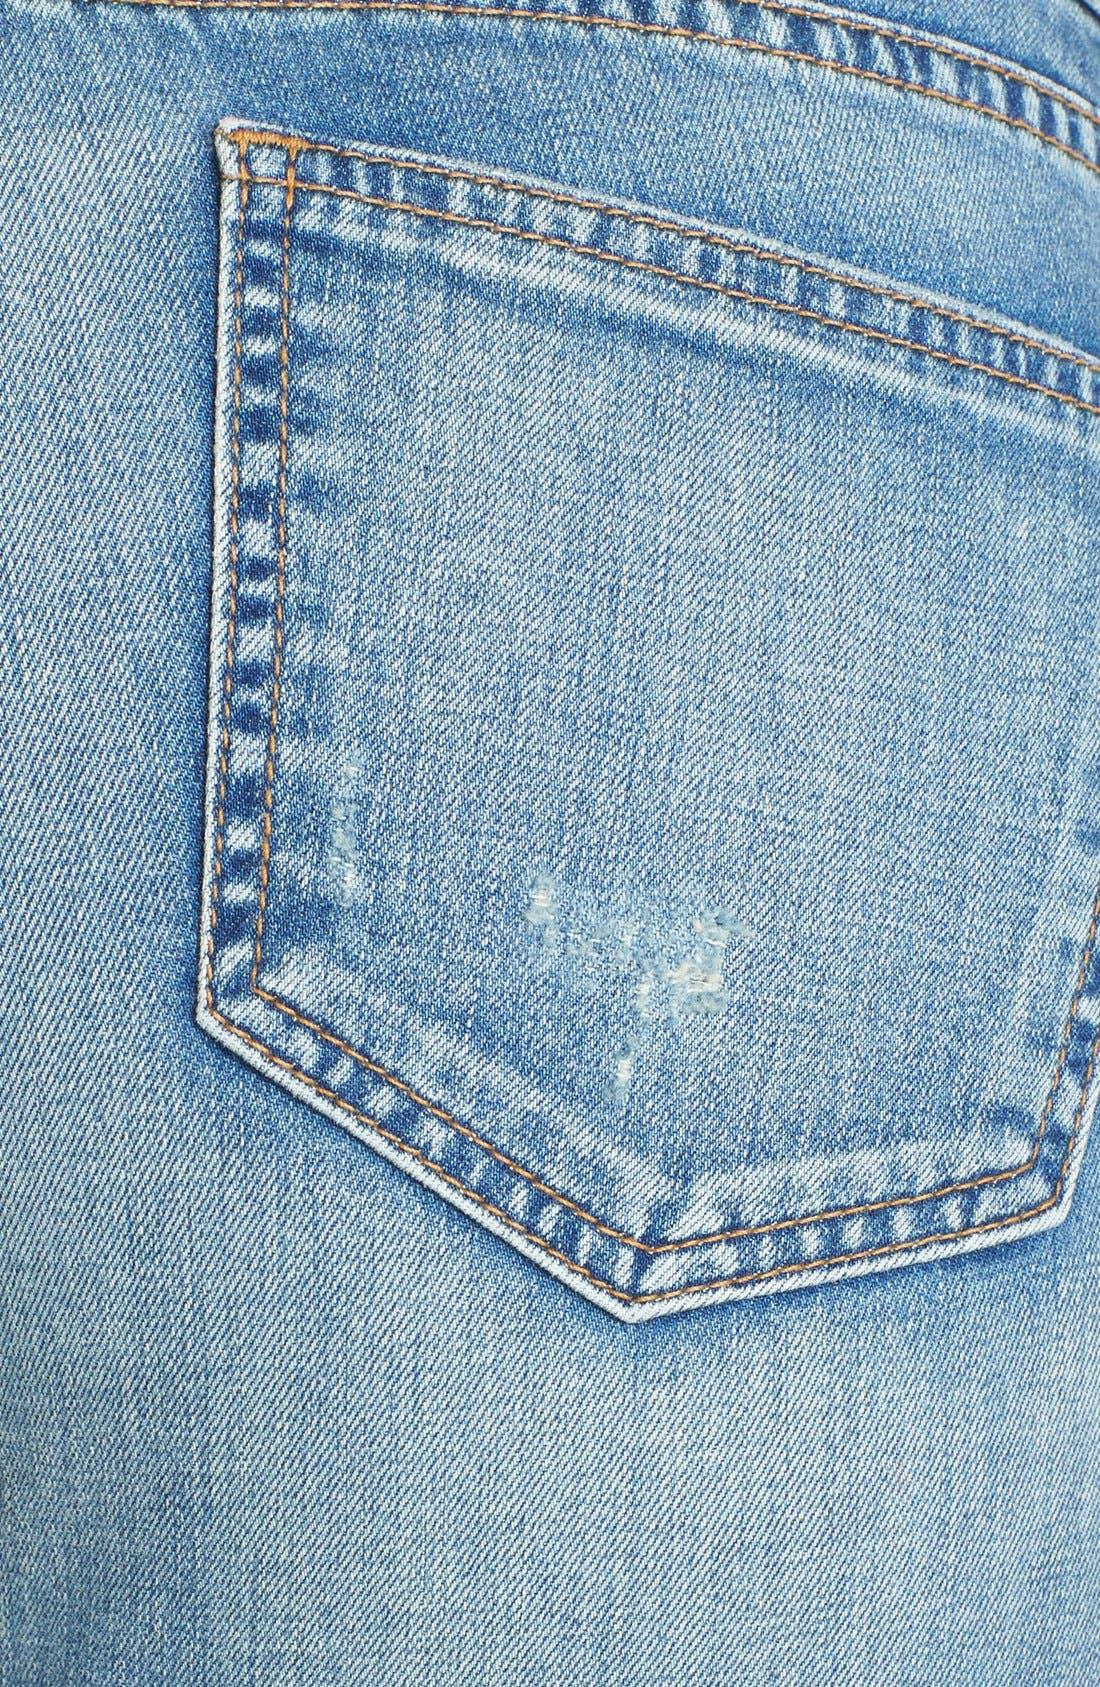 Alternate Image 3  - edyson 'Sloan' Destroyed Skinny Jeans (Marmi)